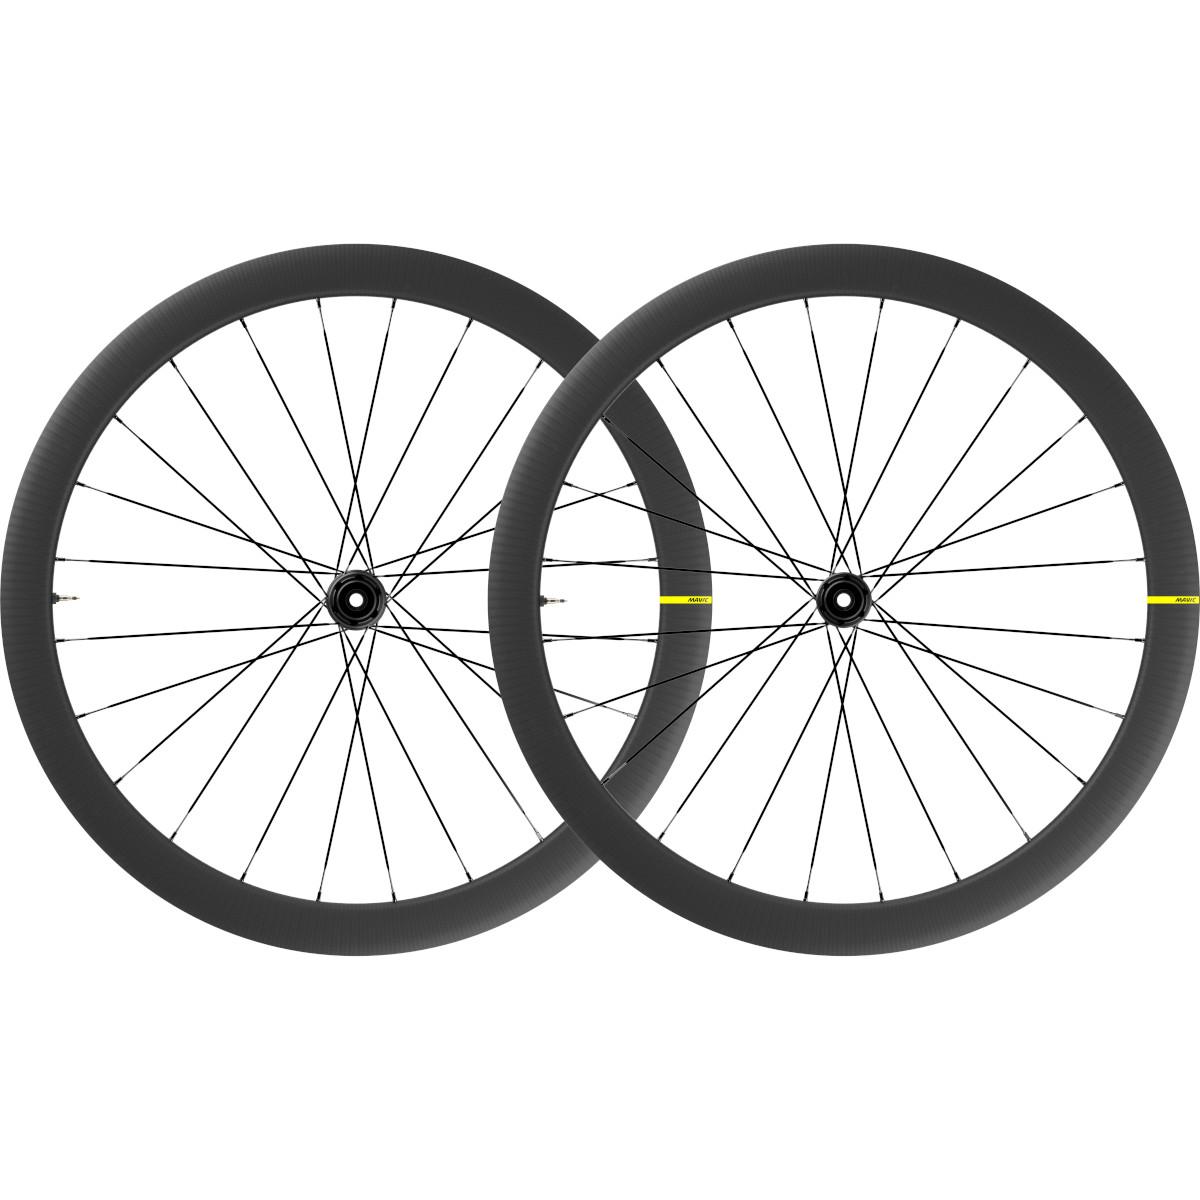 Mavic Cosmic SL 45 Disc Carbon UST Laufradsatz - Centerlock - VR: 12x100mm/QR | HR: 12x142mm/QR - Shimano HG